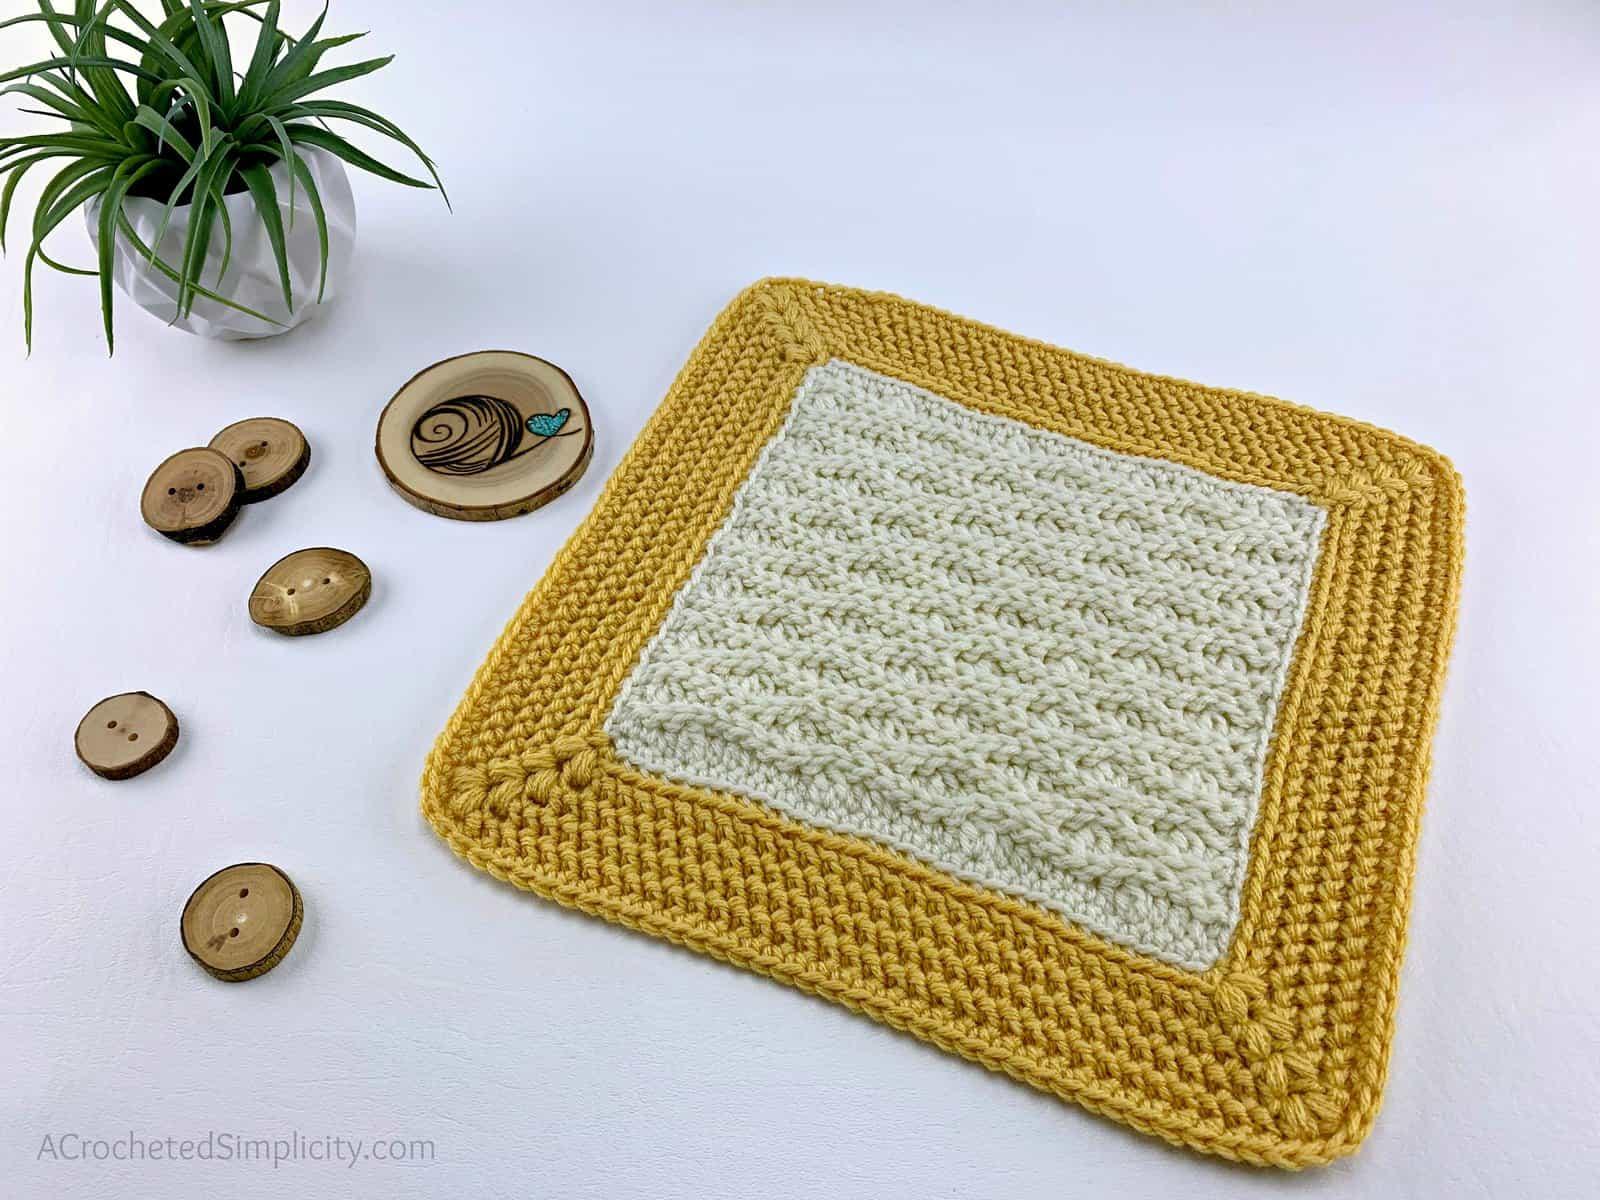 "Free Crochet Afghan Square - Triple Textures 12"" Afghan Square by A Crocheted Simplicity #freecrochetpattern #crochetafghansquare #12incheafghansquare #freecrochetblanketsquare #crochettextures #crochetafghan #crochetblanket"